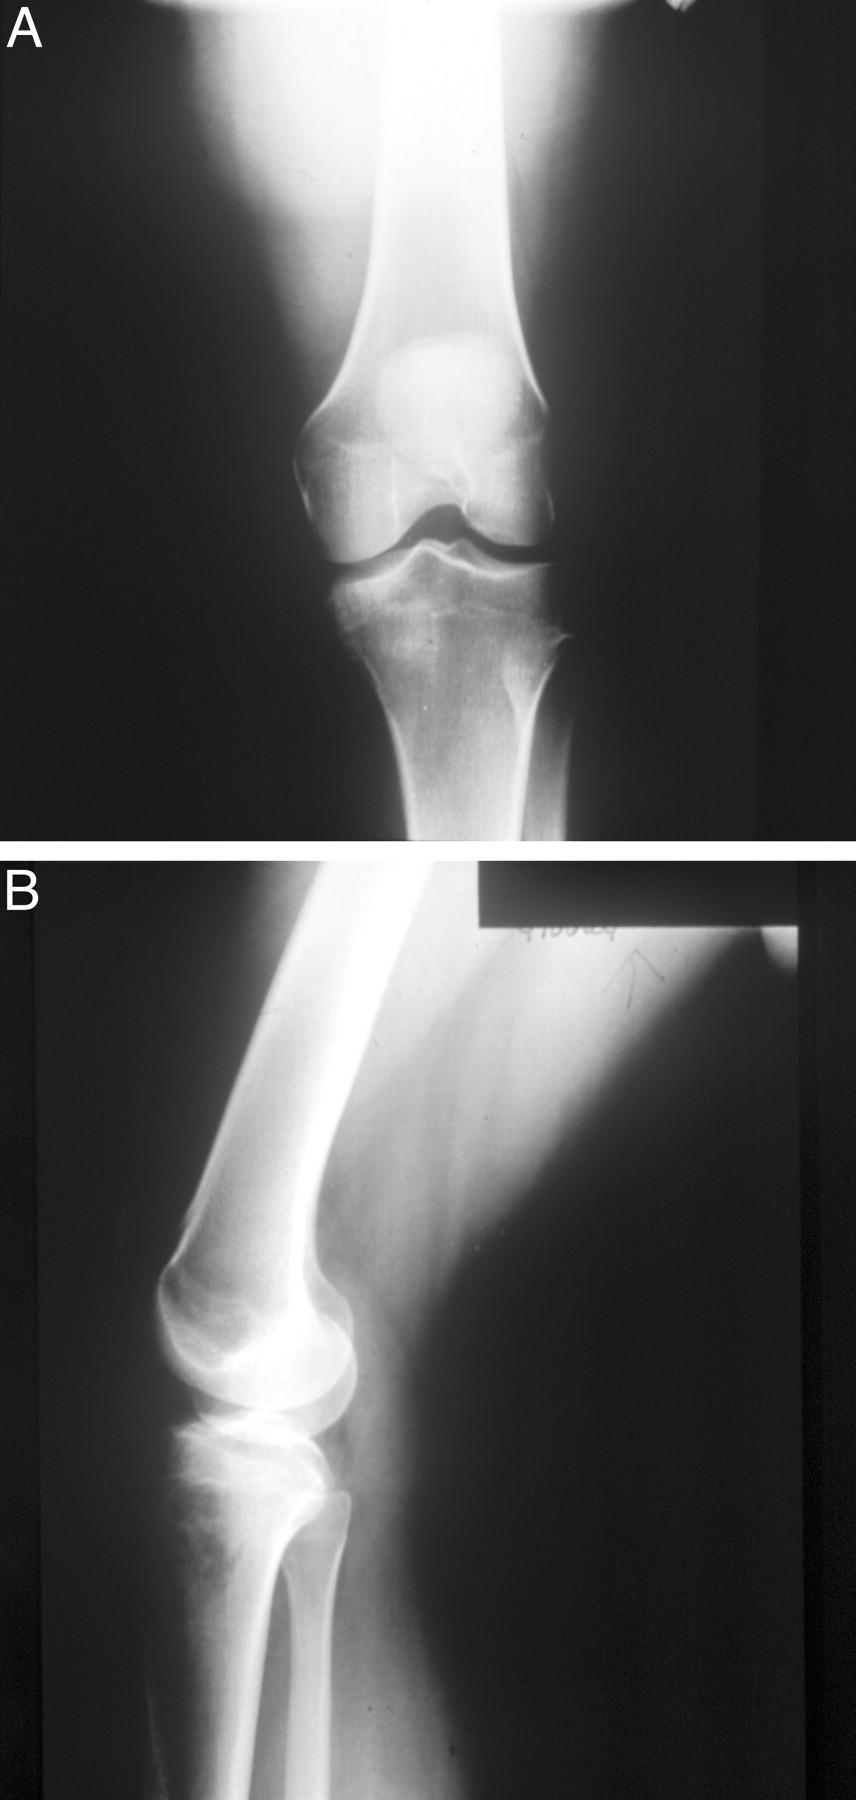 Tibial plateau stress fracture running